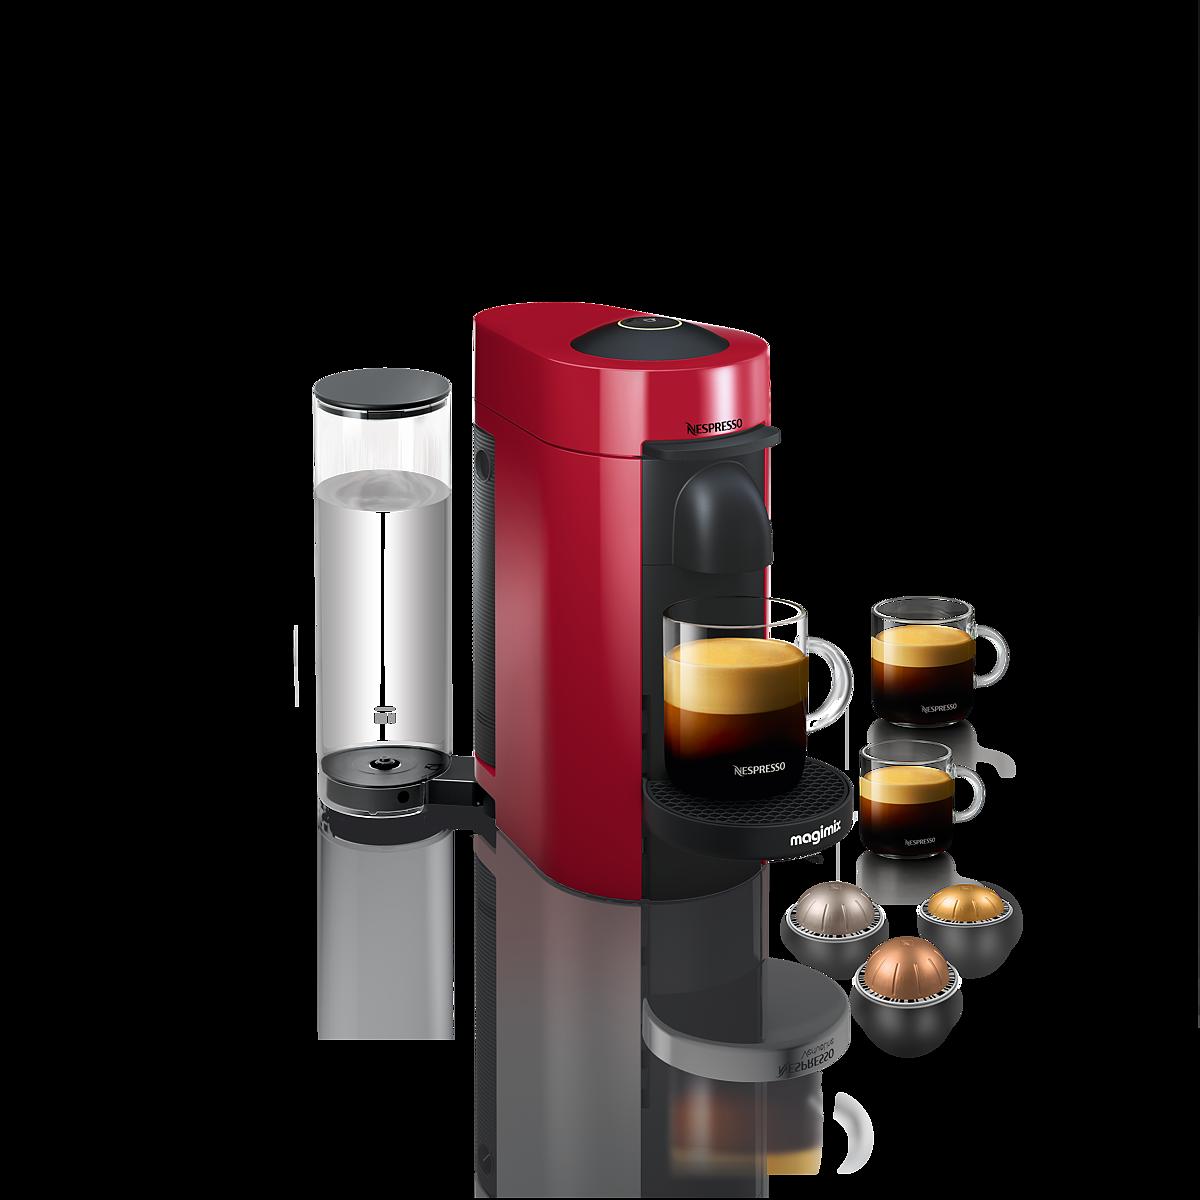 Nespresso Vertuoplus Coffee And Espresso Machine By Magimix Red